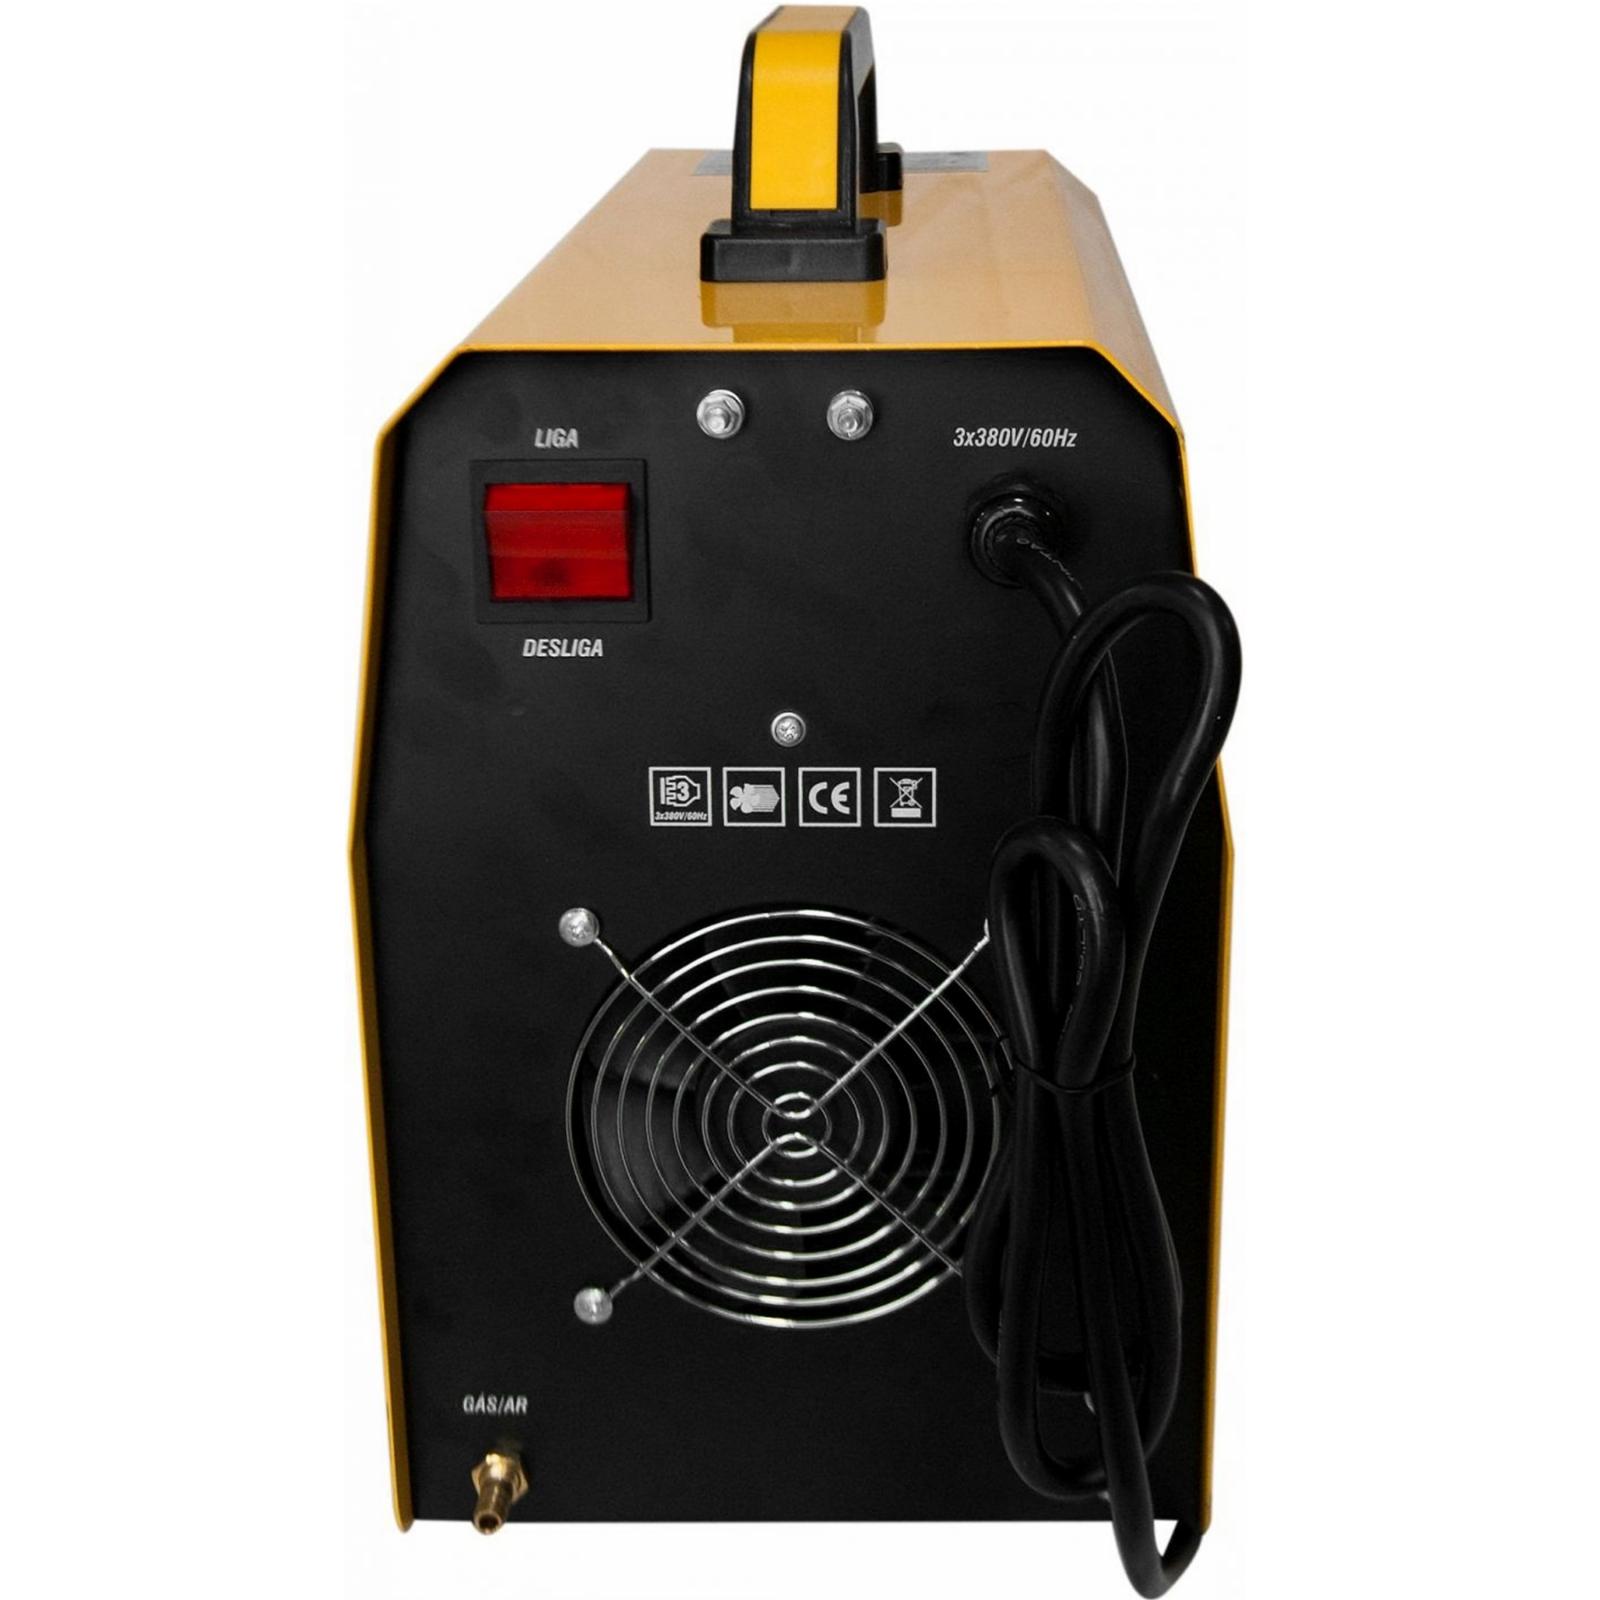 Maquina de Corte Plasma Lynus 60amp Trifásica Industrial Pl1 - Ferramentas MEP